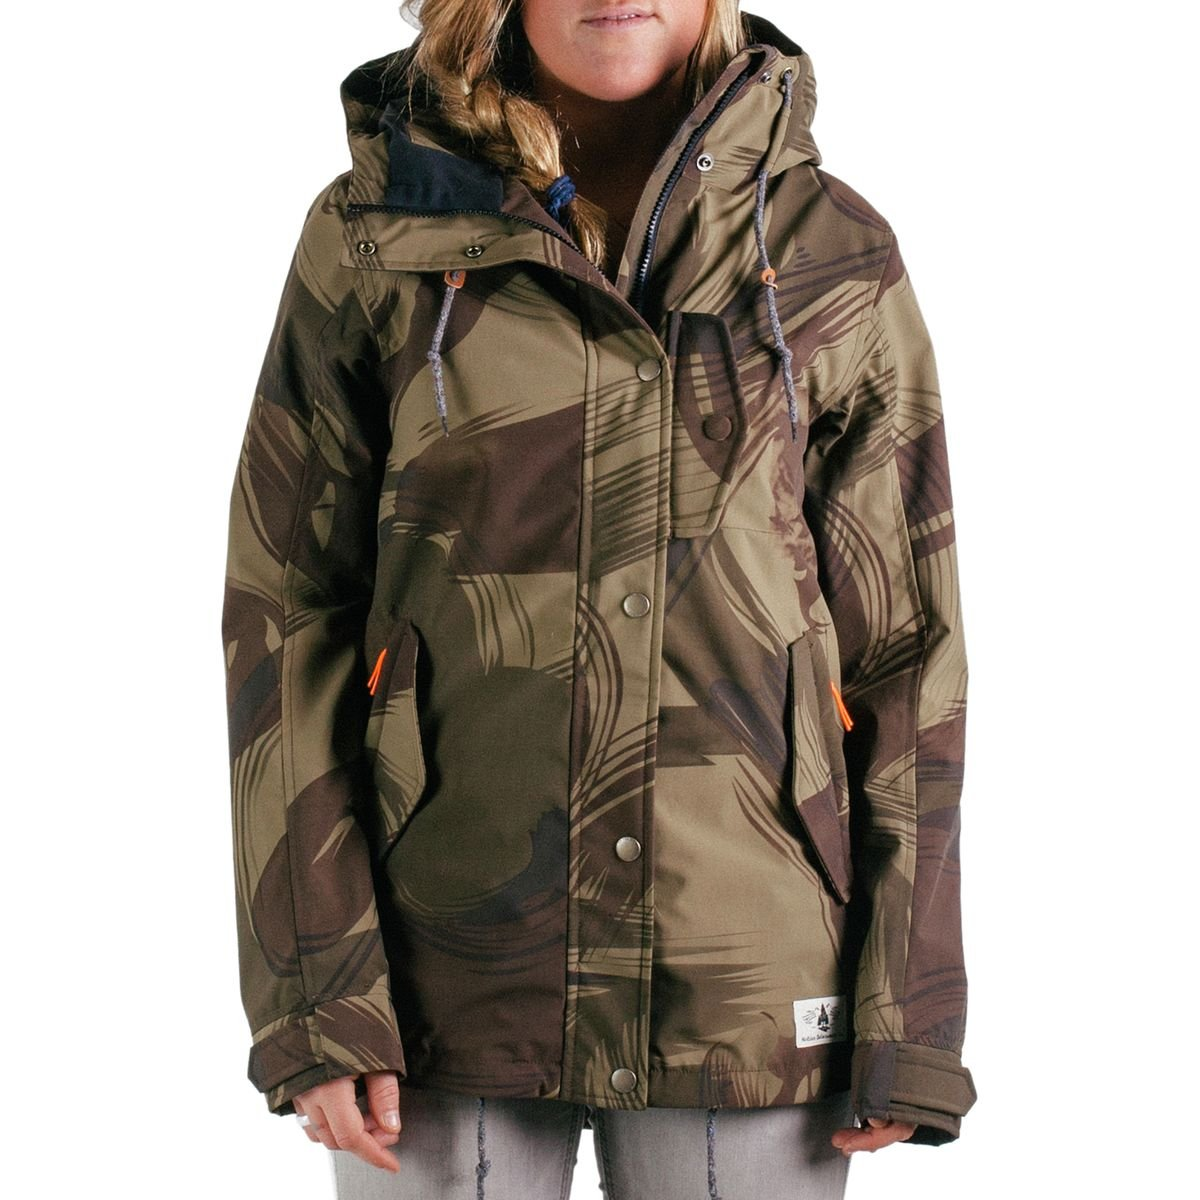 Damen Snowboard Jacke Holden Hana Jacket günstig